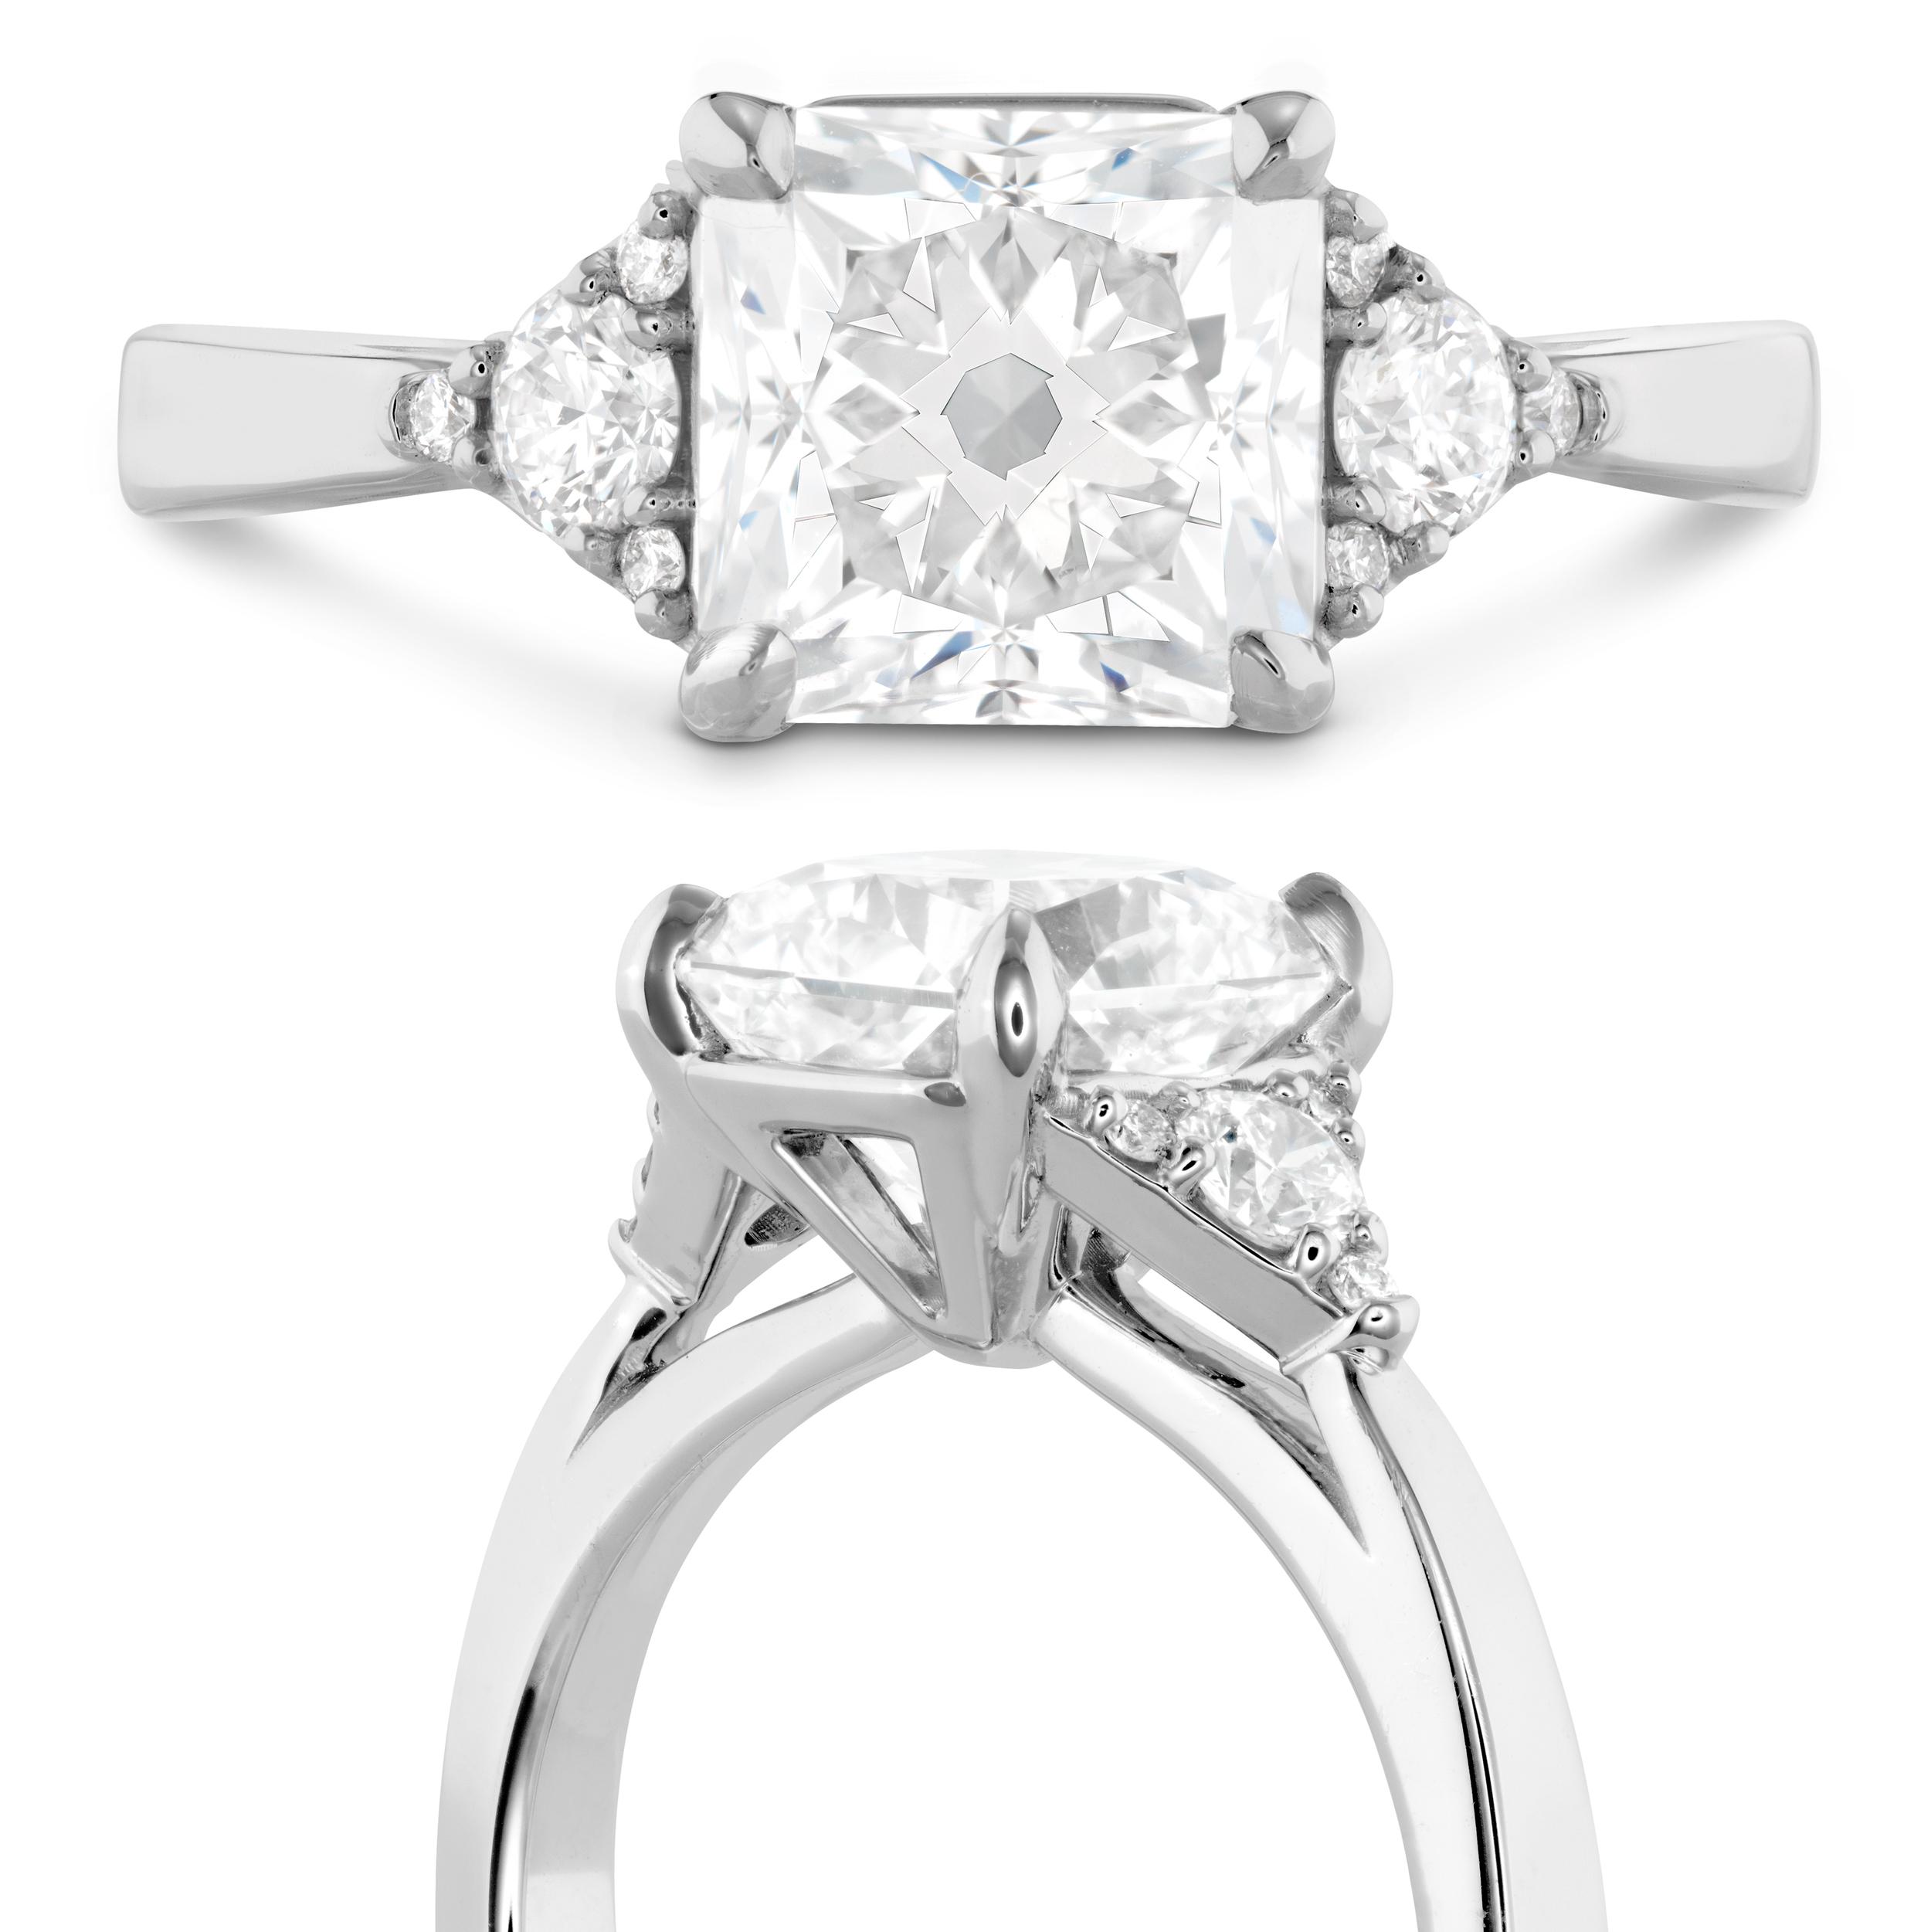 Diamond Engagement Ring   Van Gundys   Camarillo CA